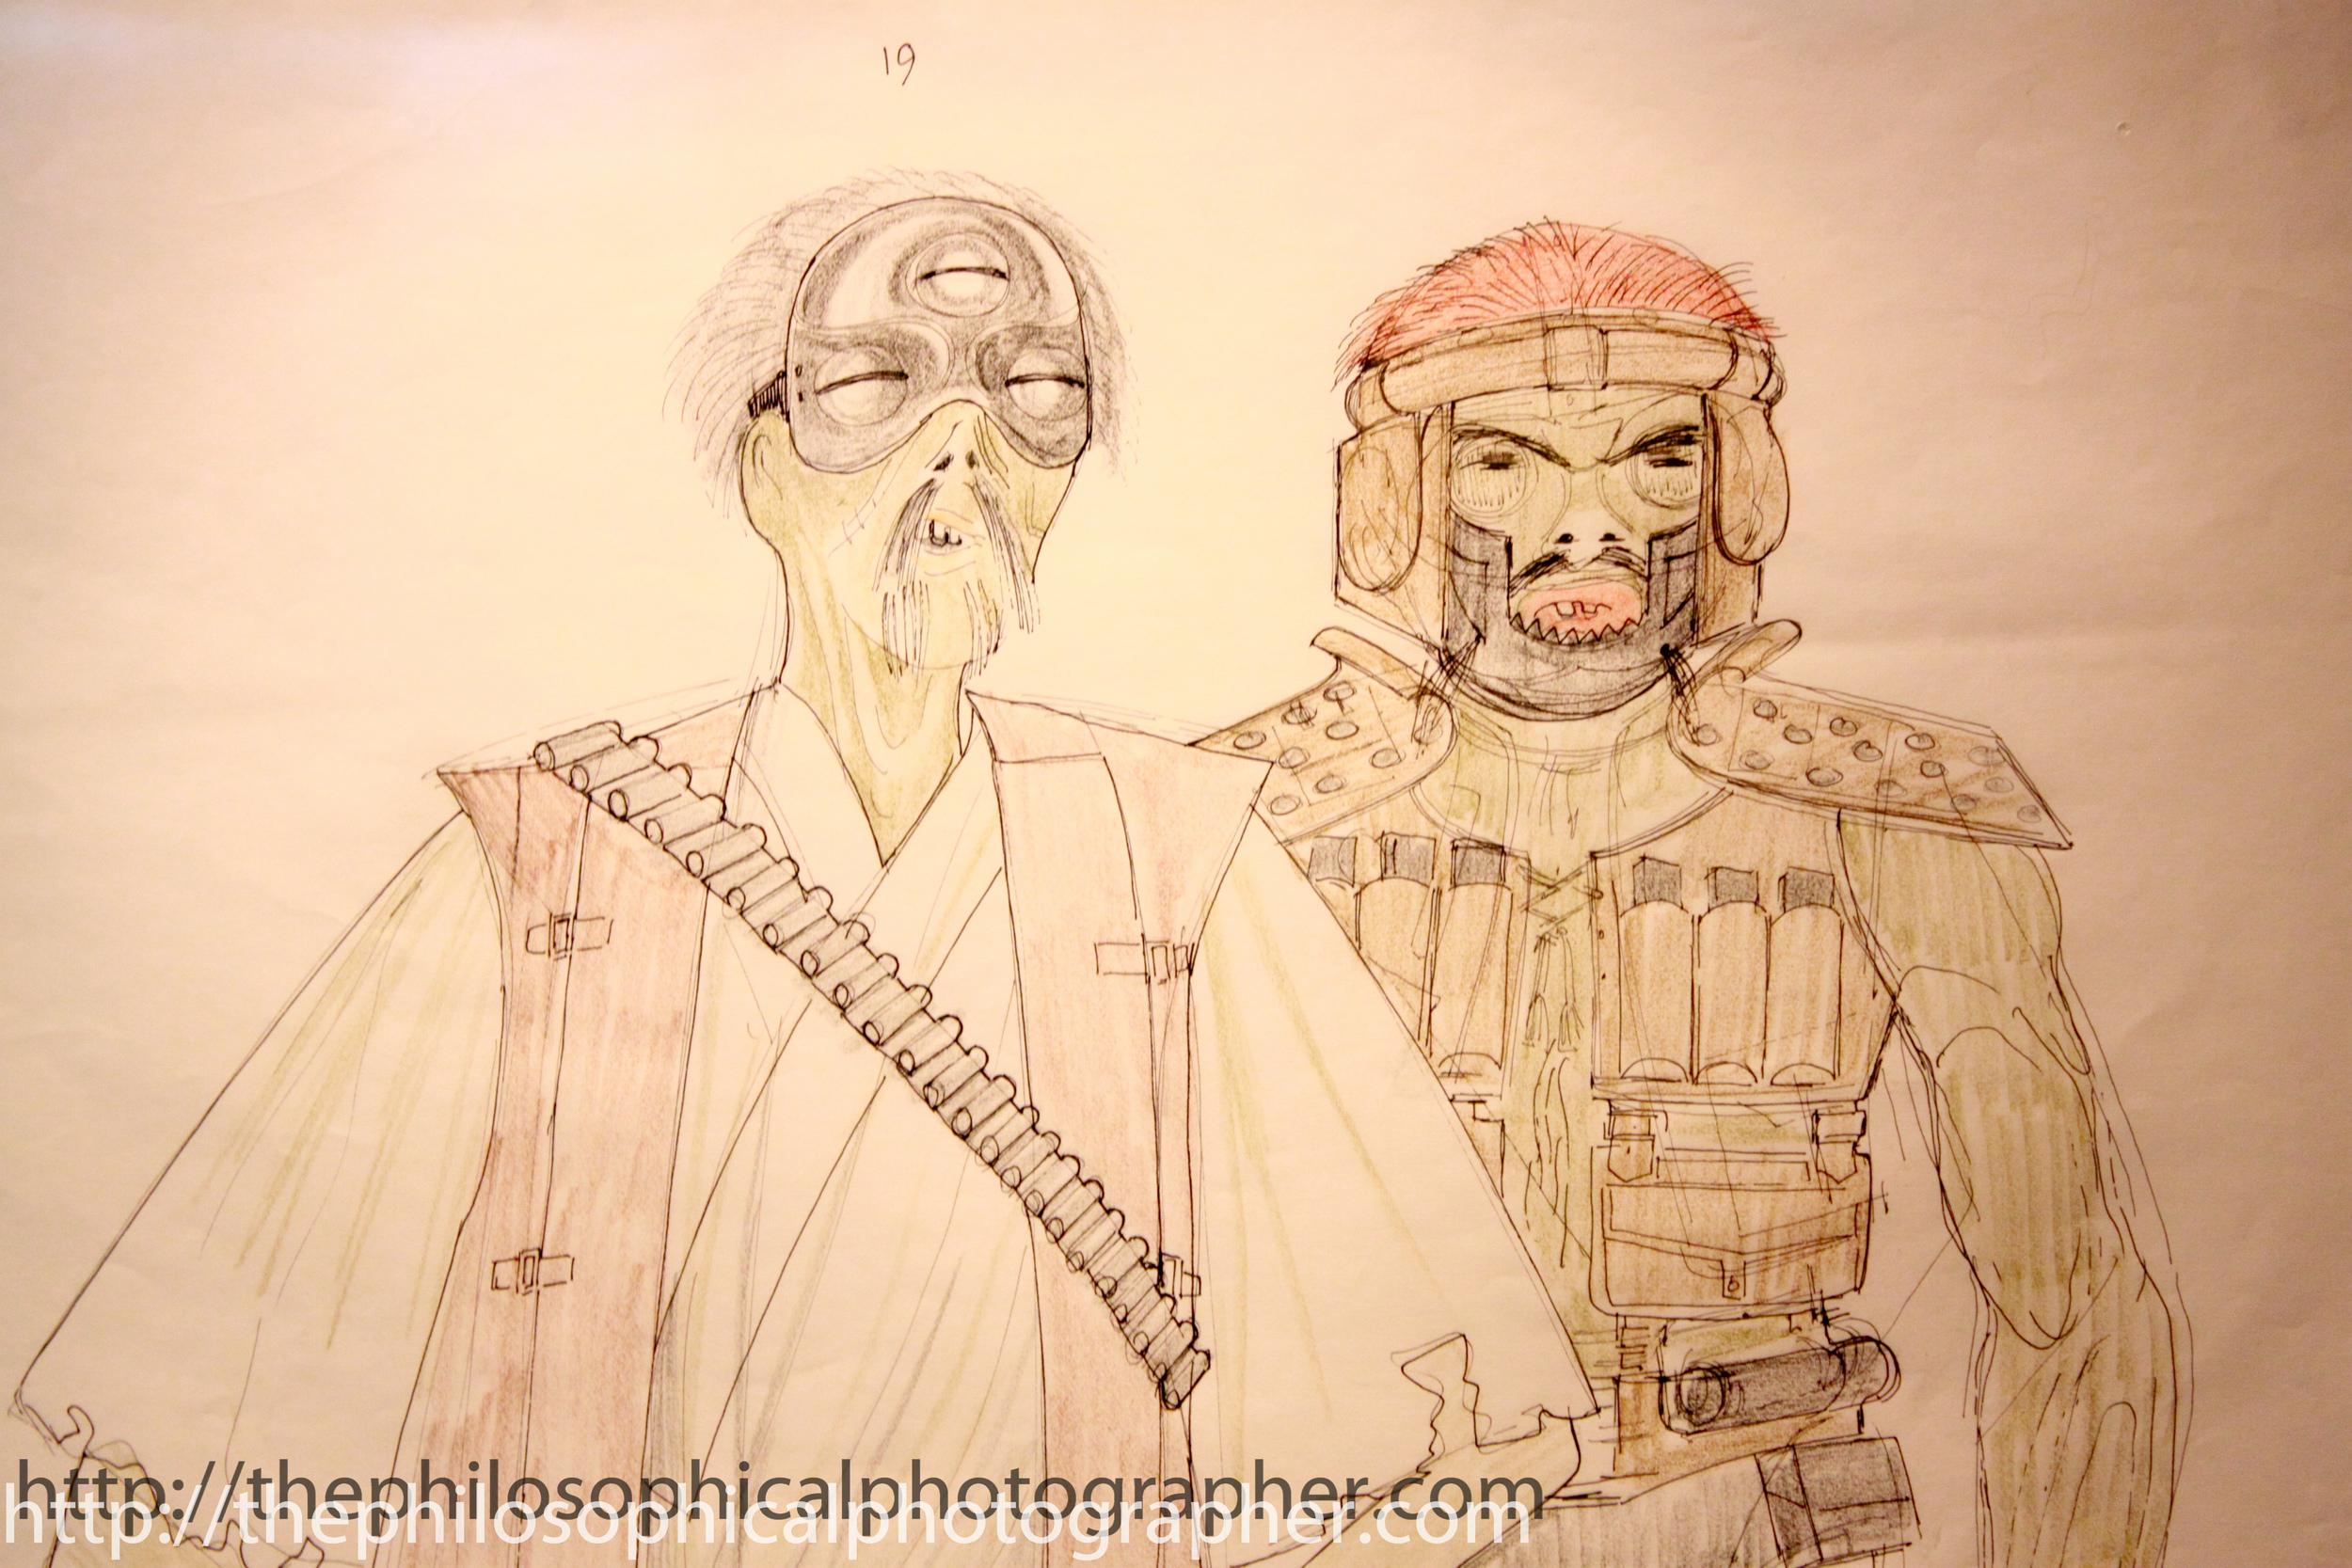 Jabba the Hutt and Montross